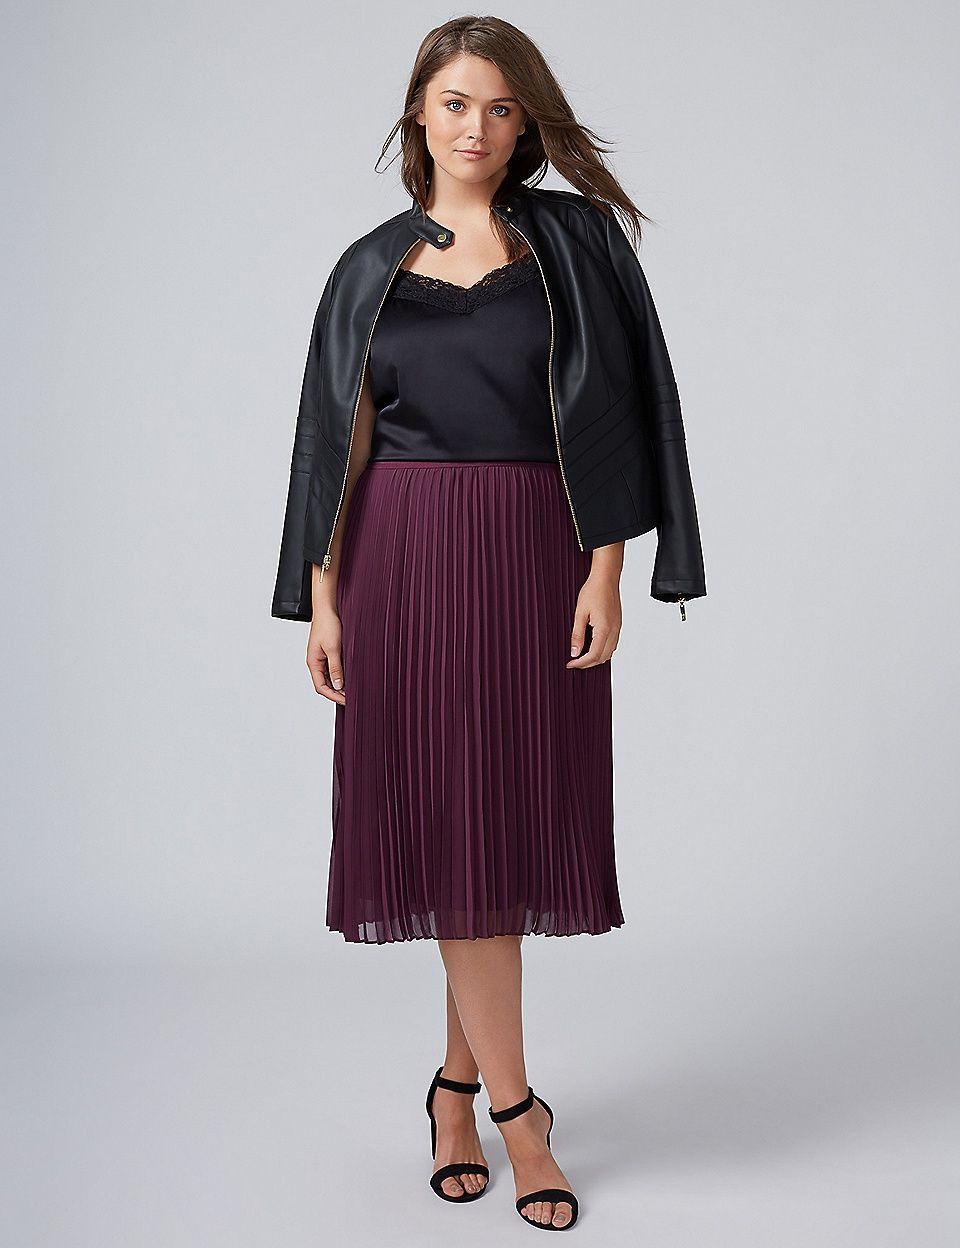 c191219117 Pleated Chiffon Midi Skirt   Lane Bryant Curvy Girl Fashion, Plus Size  Fashion, Plus